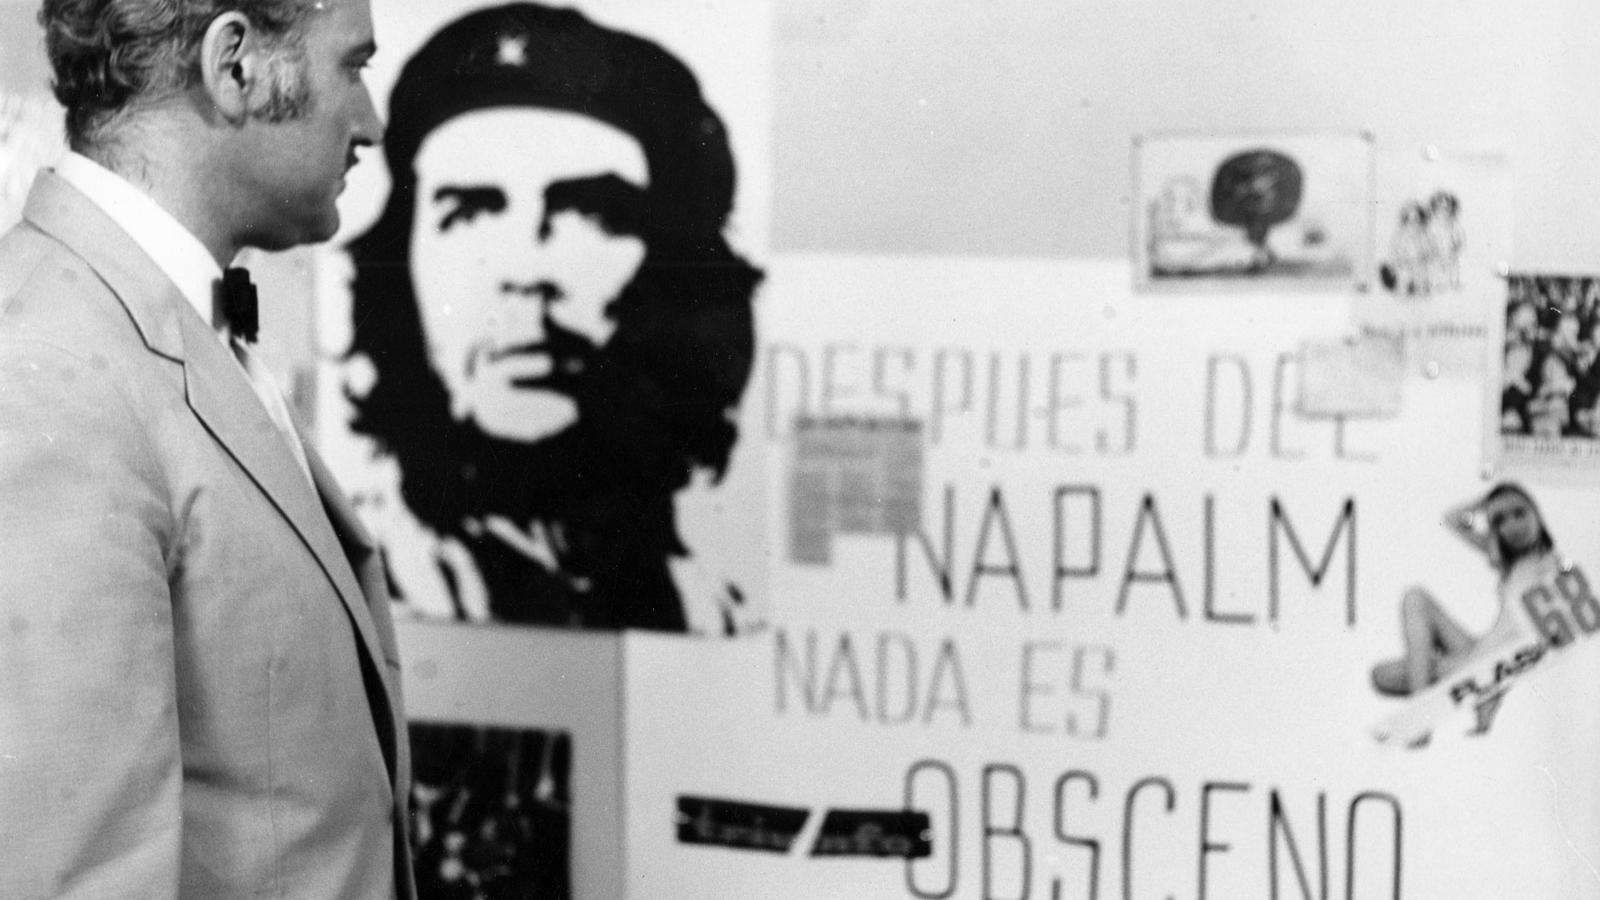 'La respuesta', dirigida per Josep Maria Forn